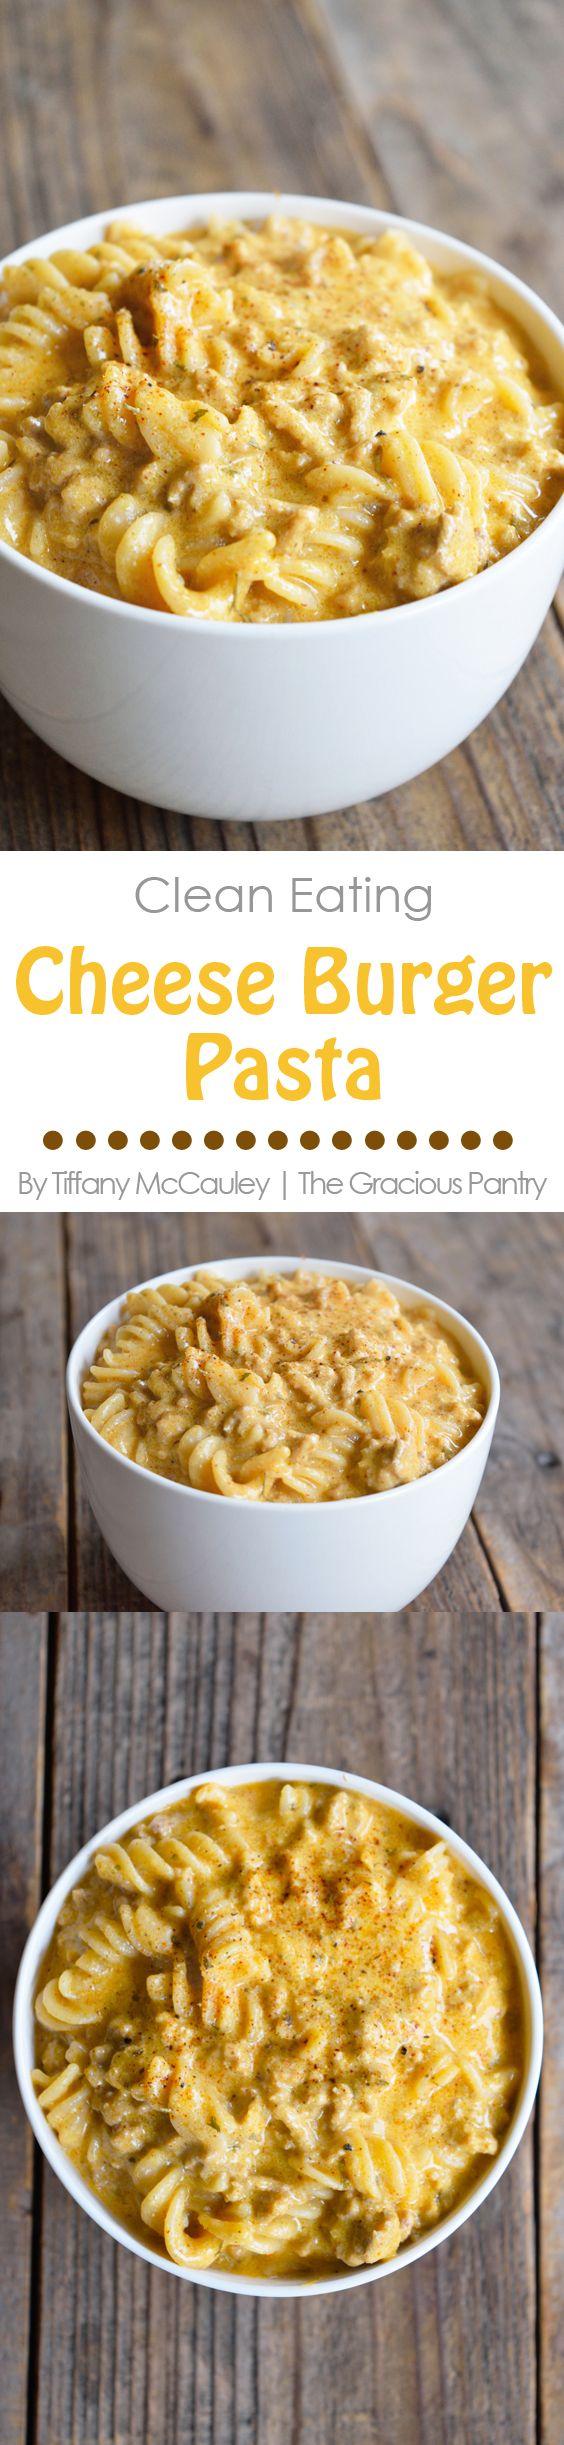 Clean Eating Recipes | Hamburger Helper Recipe | Cheese Burger Pasta Recipe | Dinner Recipes